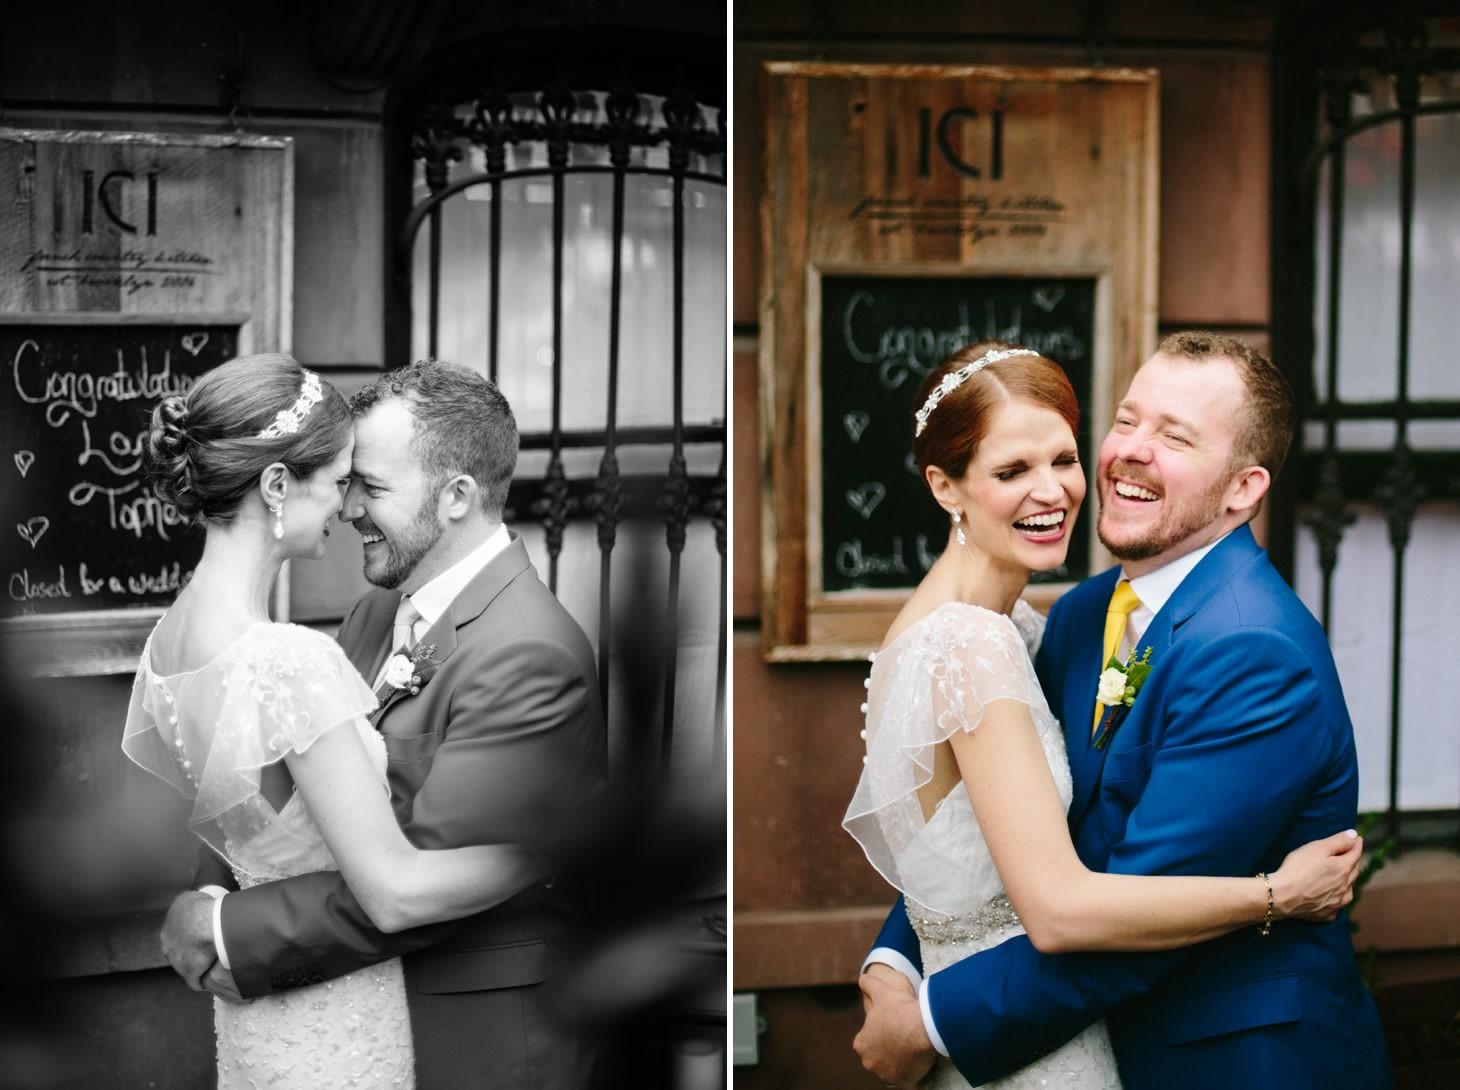 brooklyn-restaurant-wedding-nyc-weddingi-photographer-smitten-chickens22.jpg